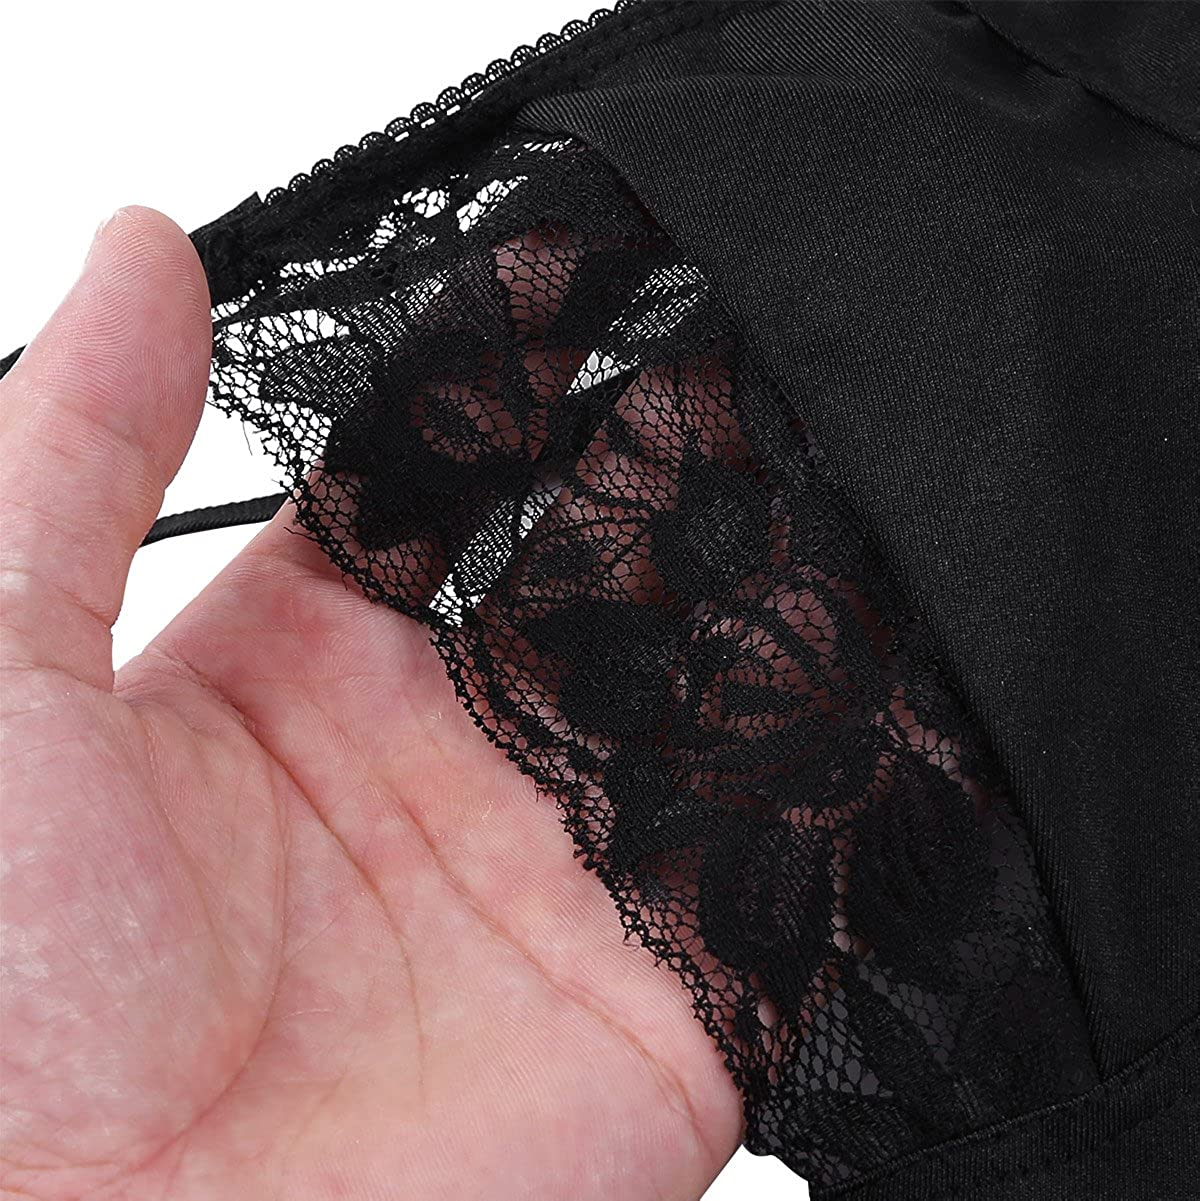 Hularka Mens Sissy Floral Lace Sheer Wireless No Padded Bra Top Bralette Underwear Lingerie